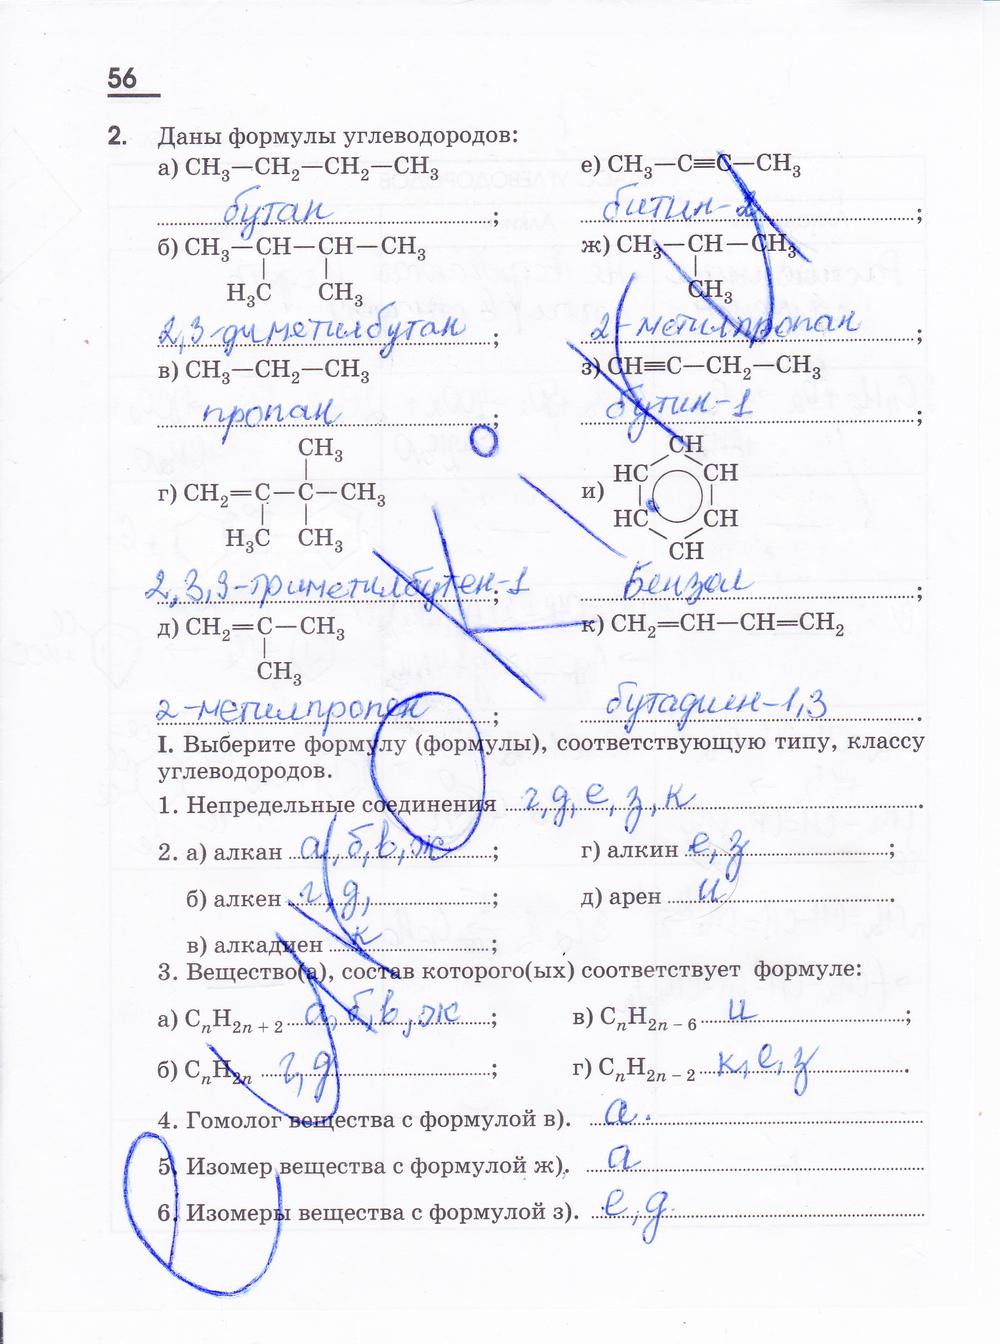 Гдз по химии рабочие тетради 10 класс